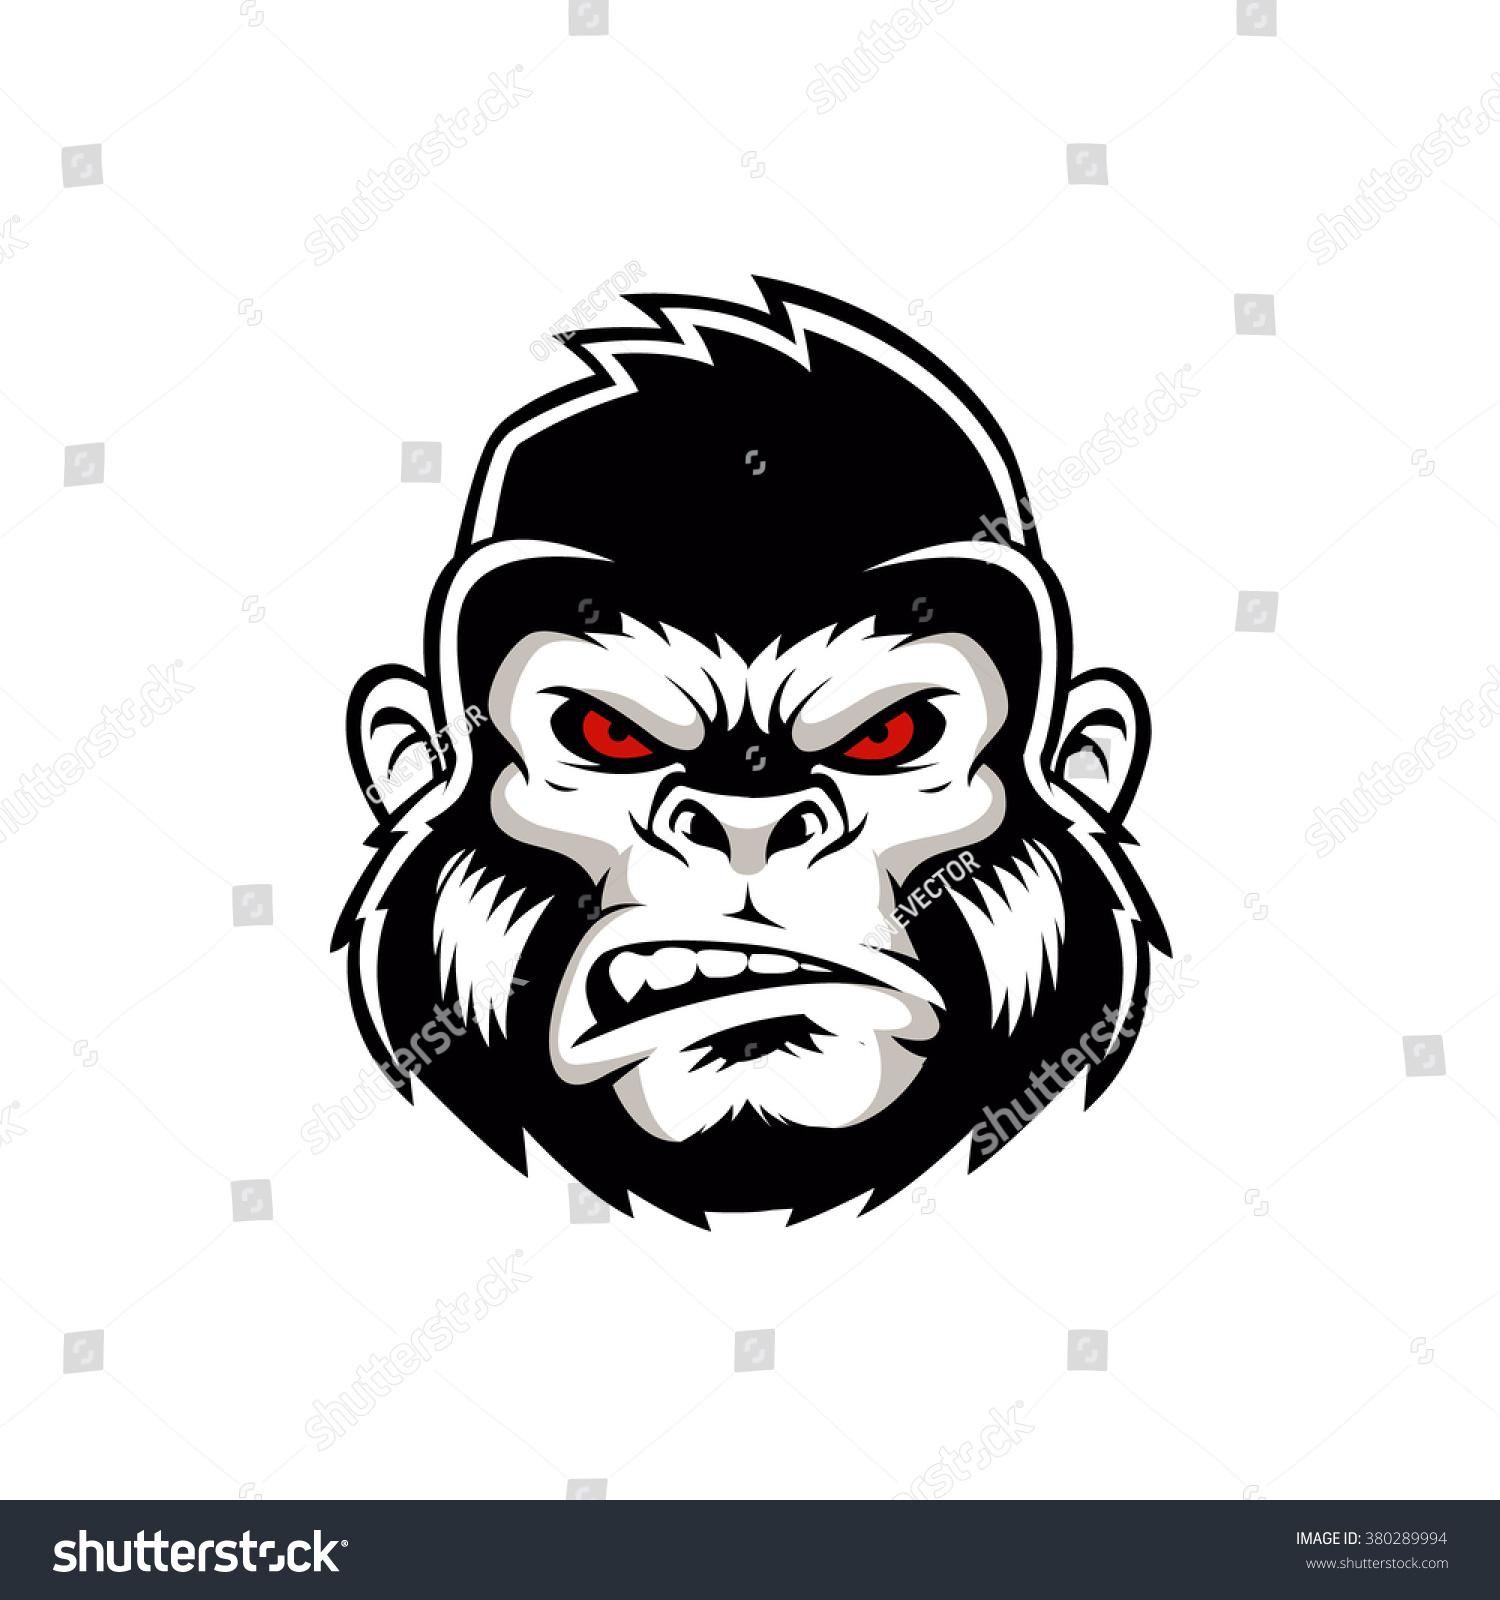 Gorilla vector head - photo#1